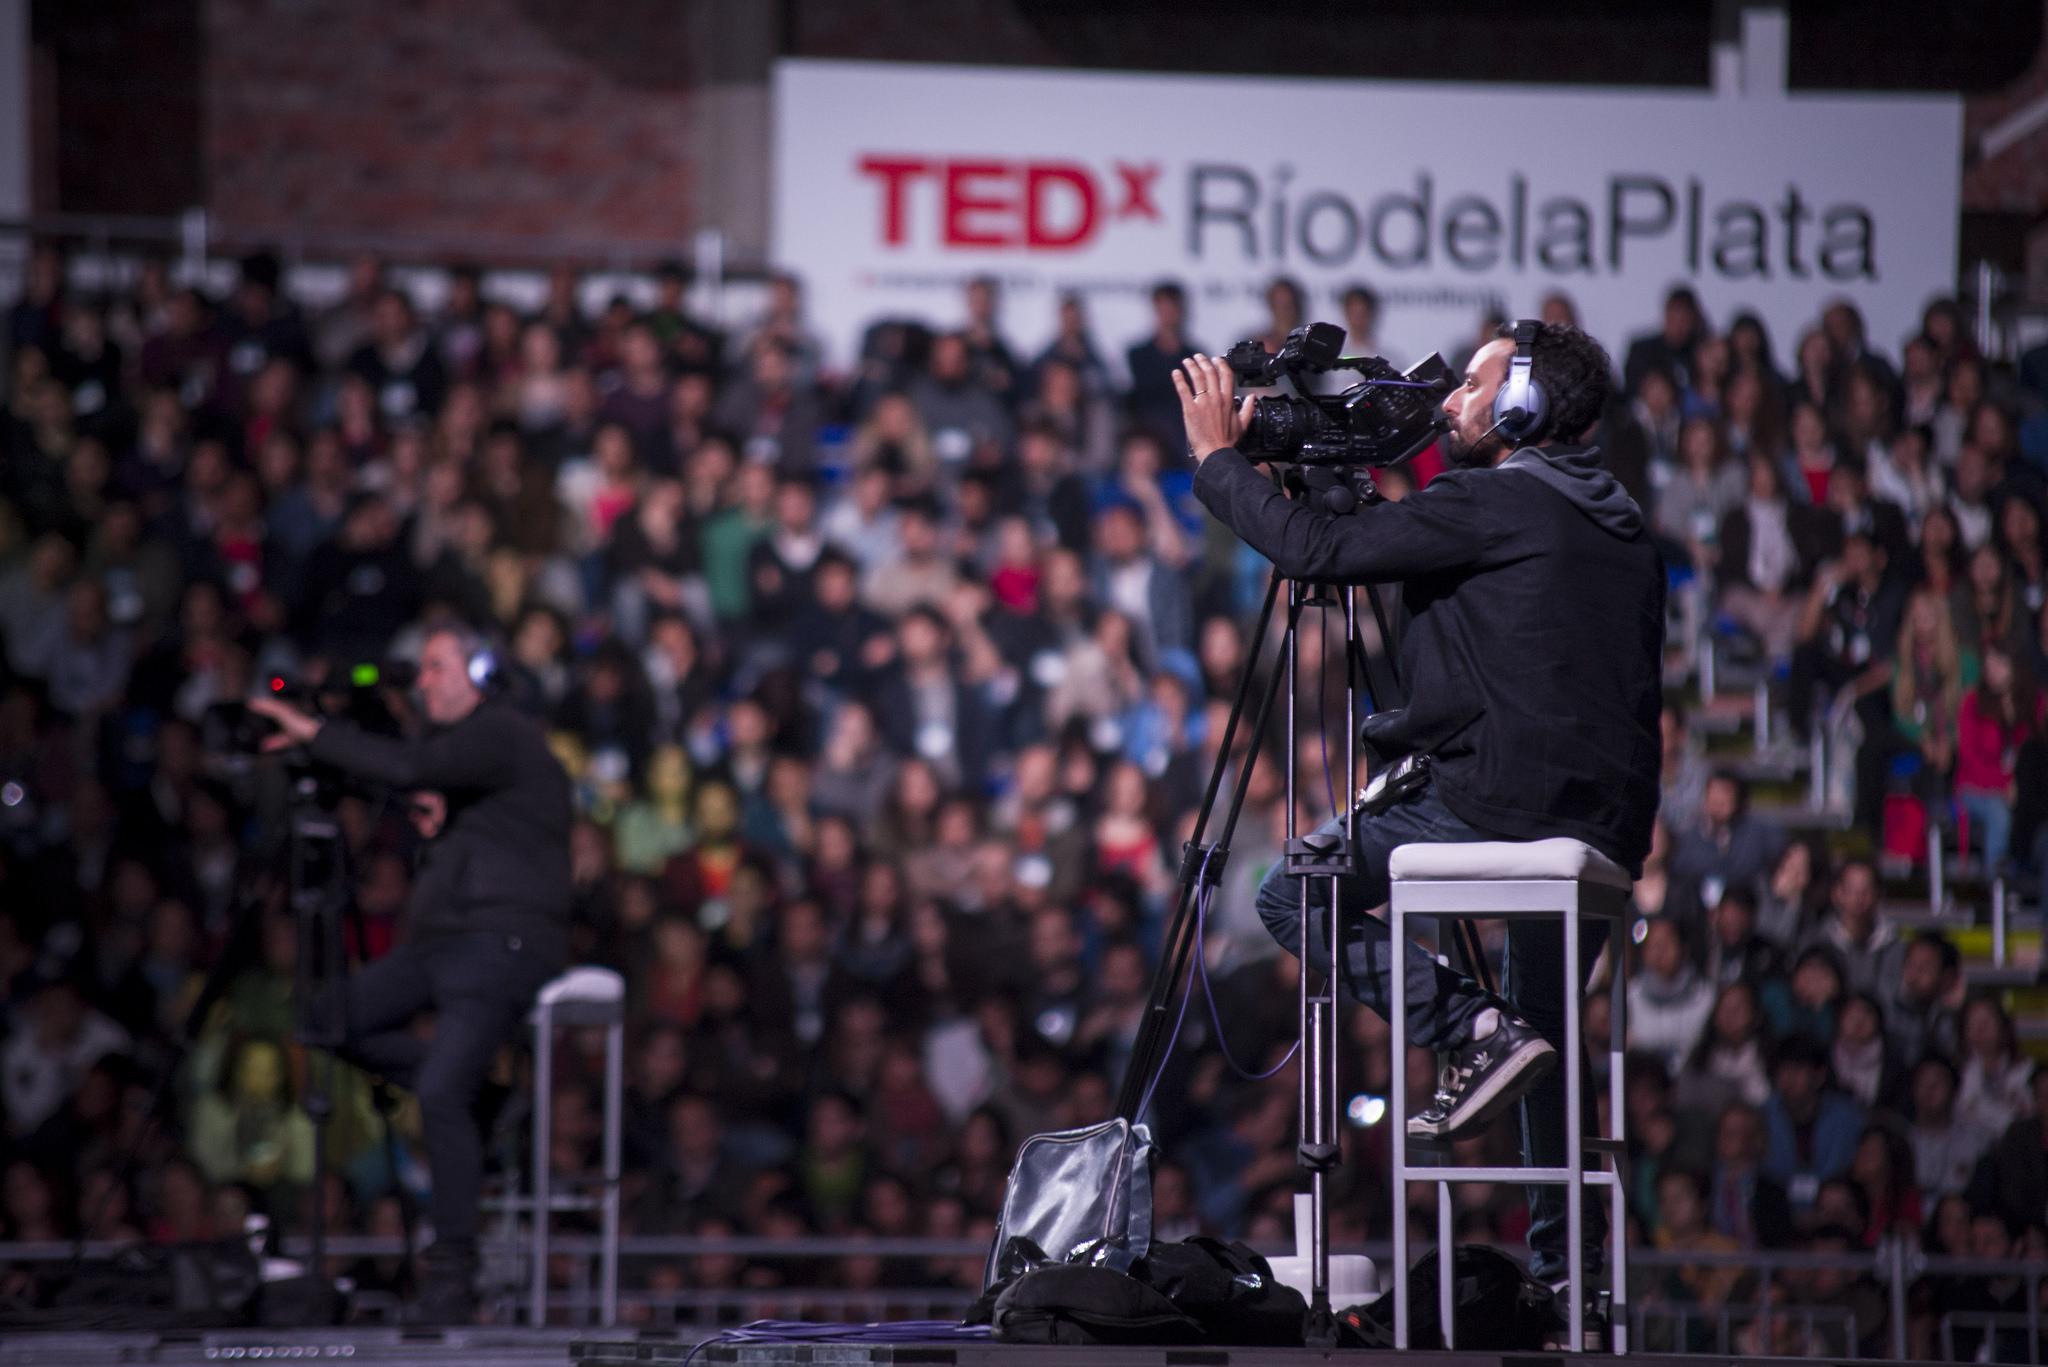 A cameraman nestled amongst the crowd. Photo: